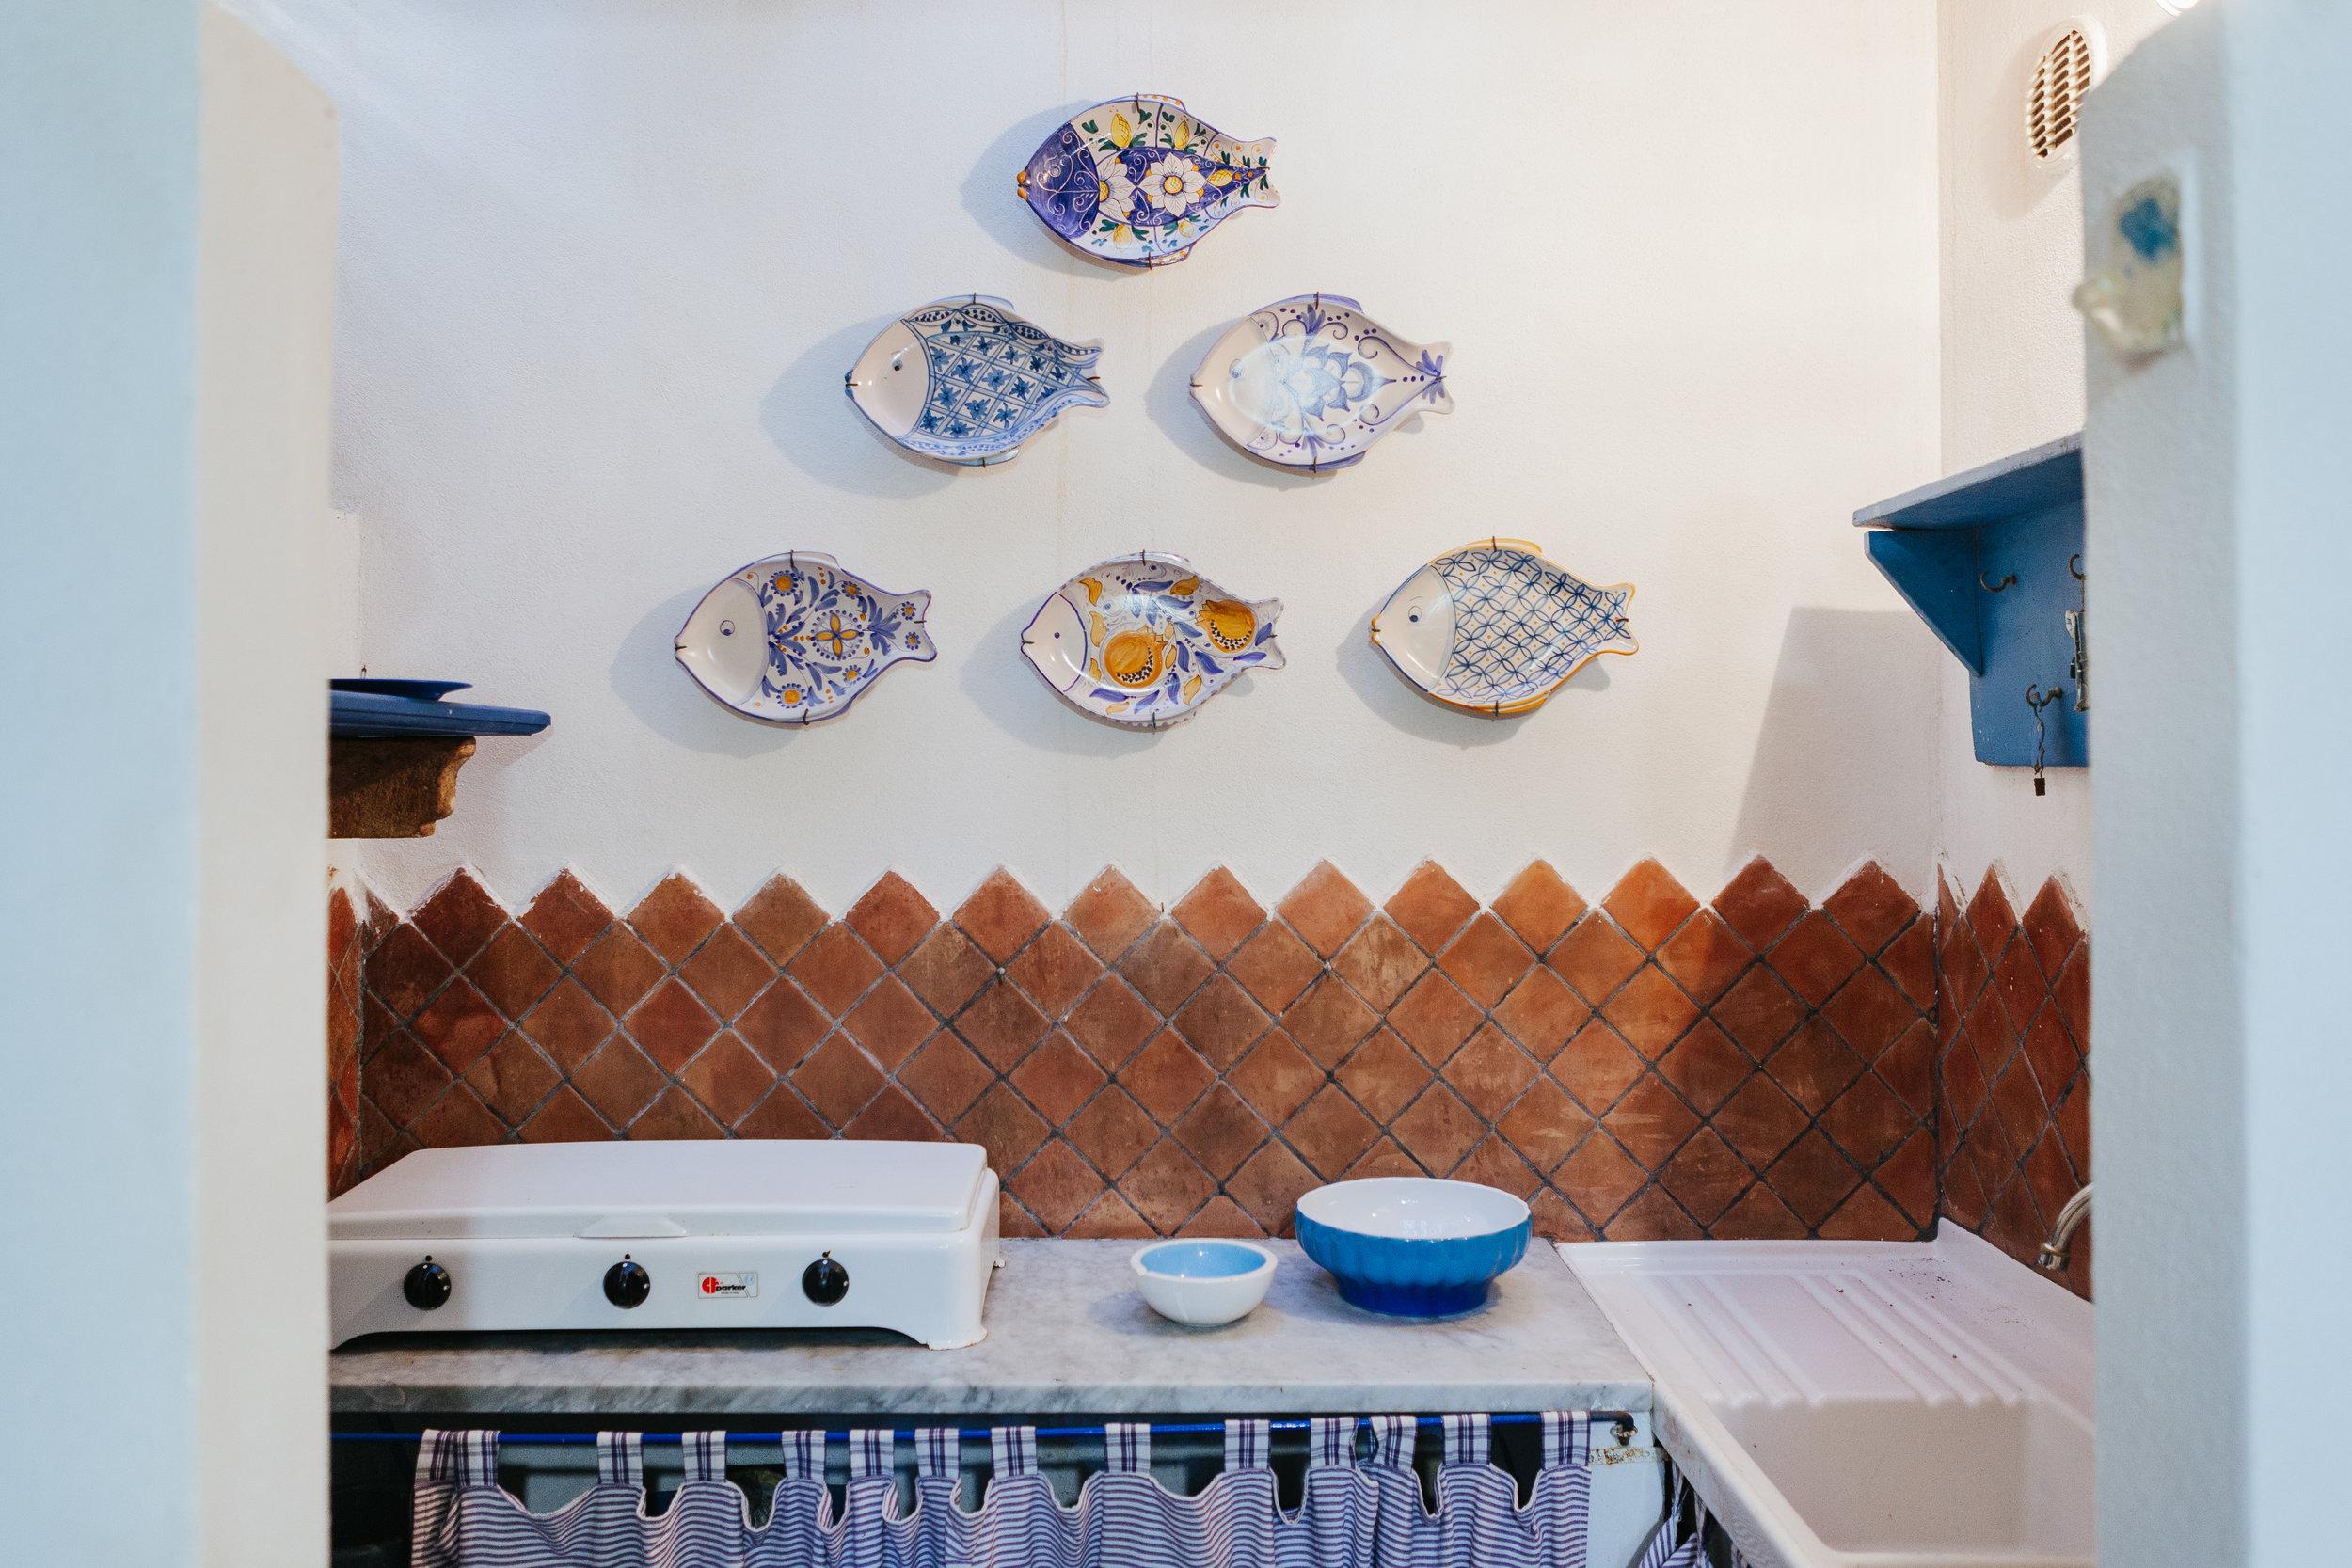 36sampieri-casa-vacanze-sicilia-appartamento-sicily-holiday-apartment-casazzurra-italia-italy.jpg